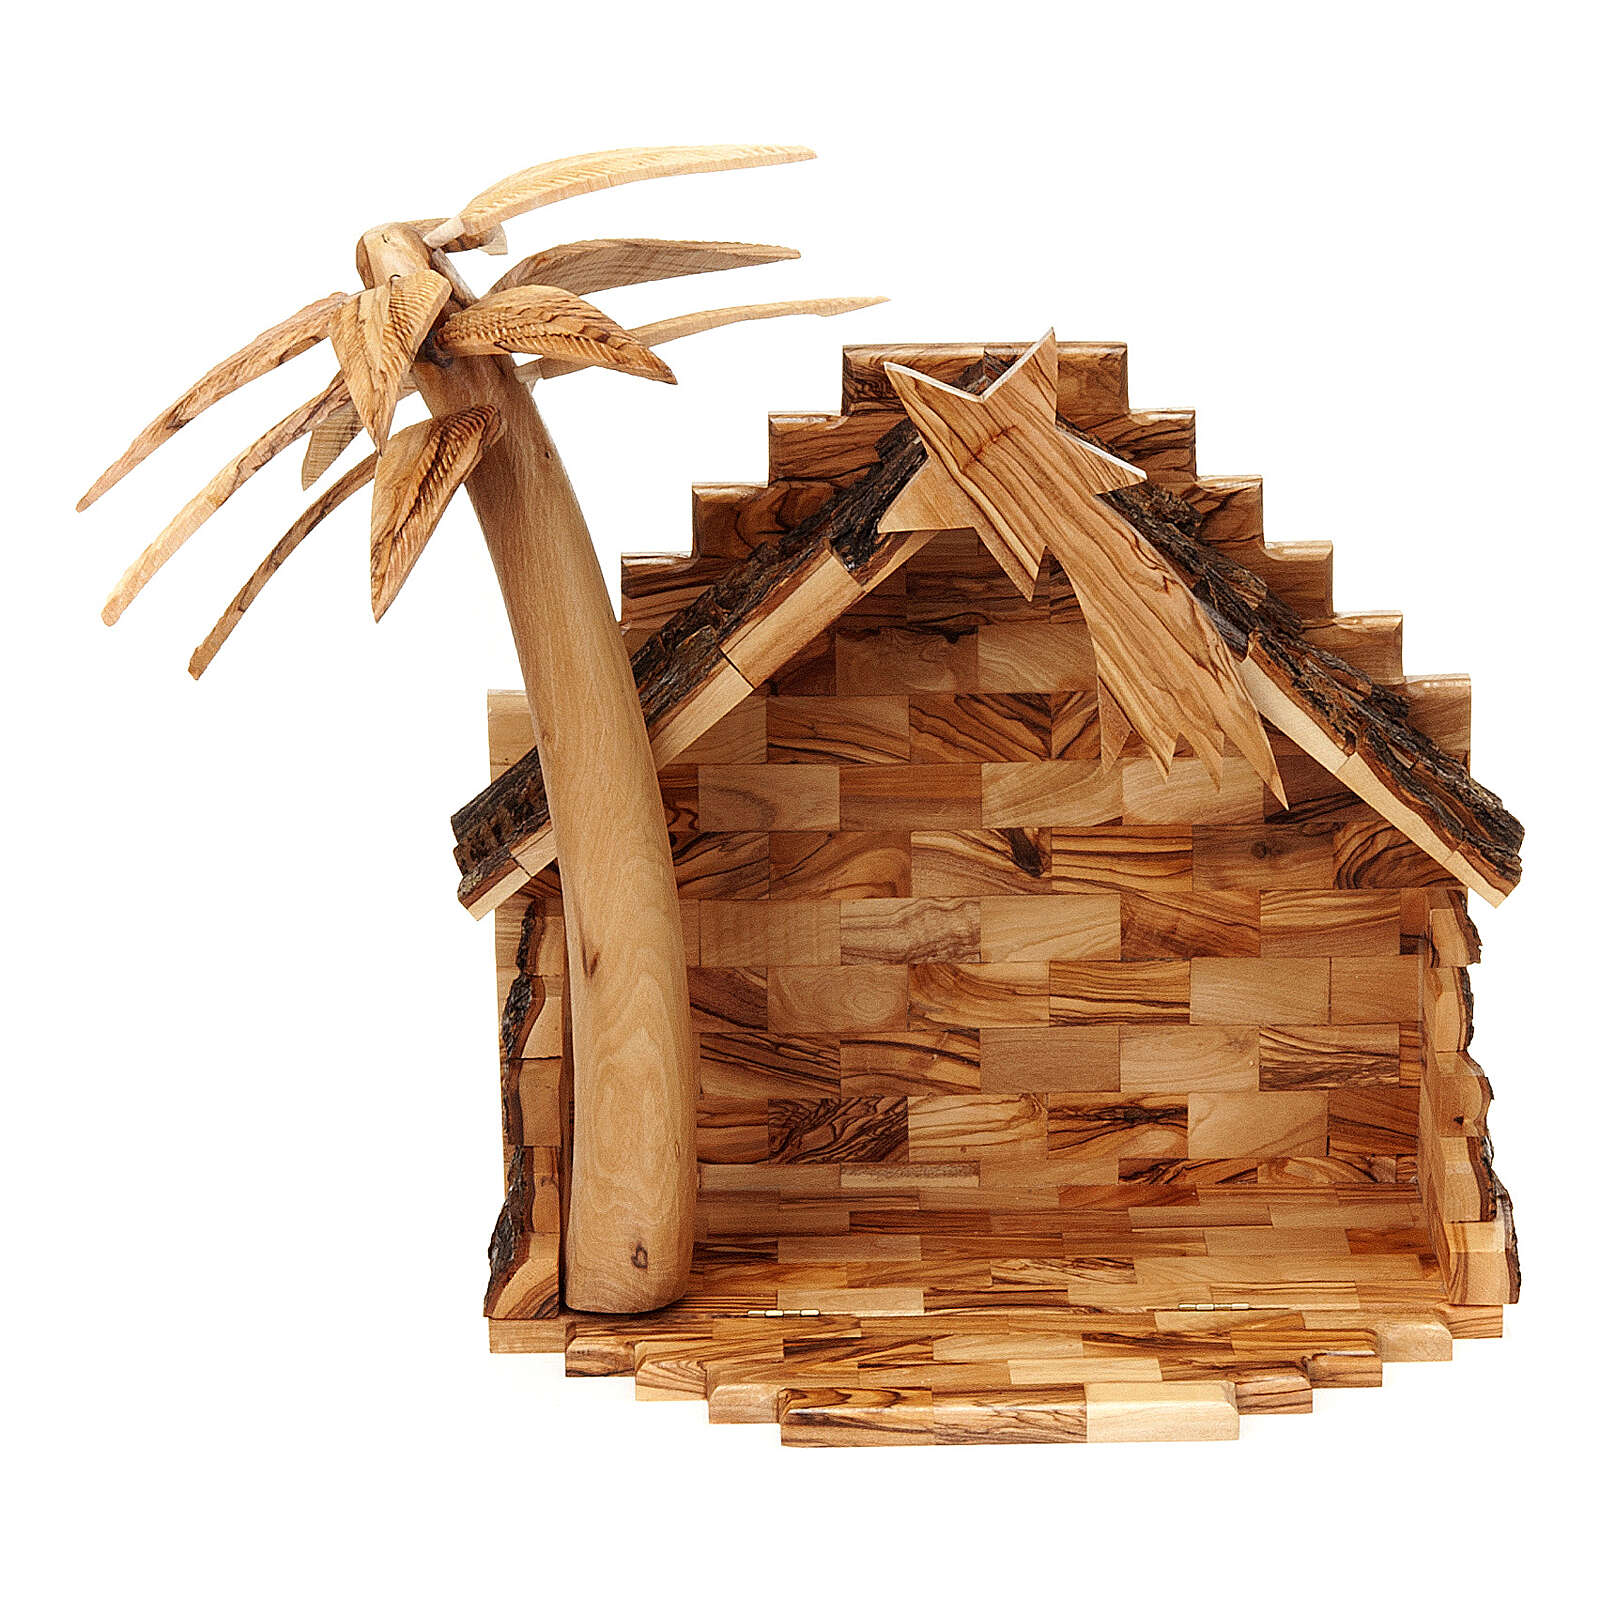 Szopka z drewna oliwnego Betlejem 15 cm 4